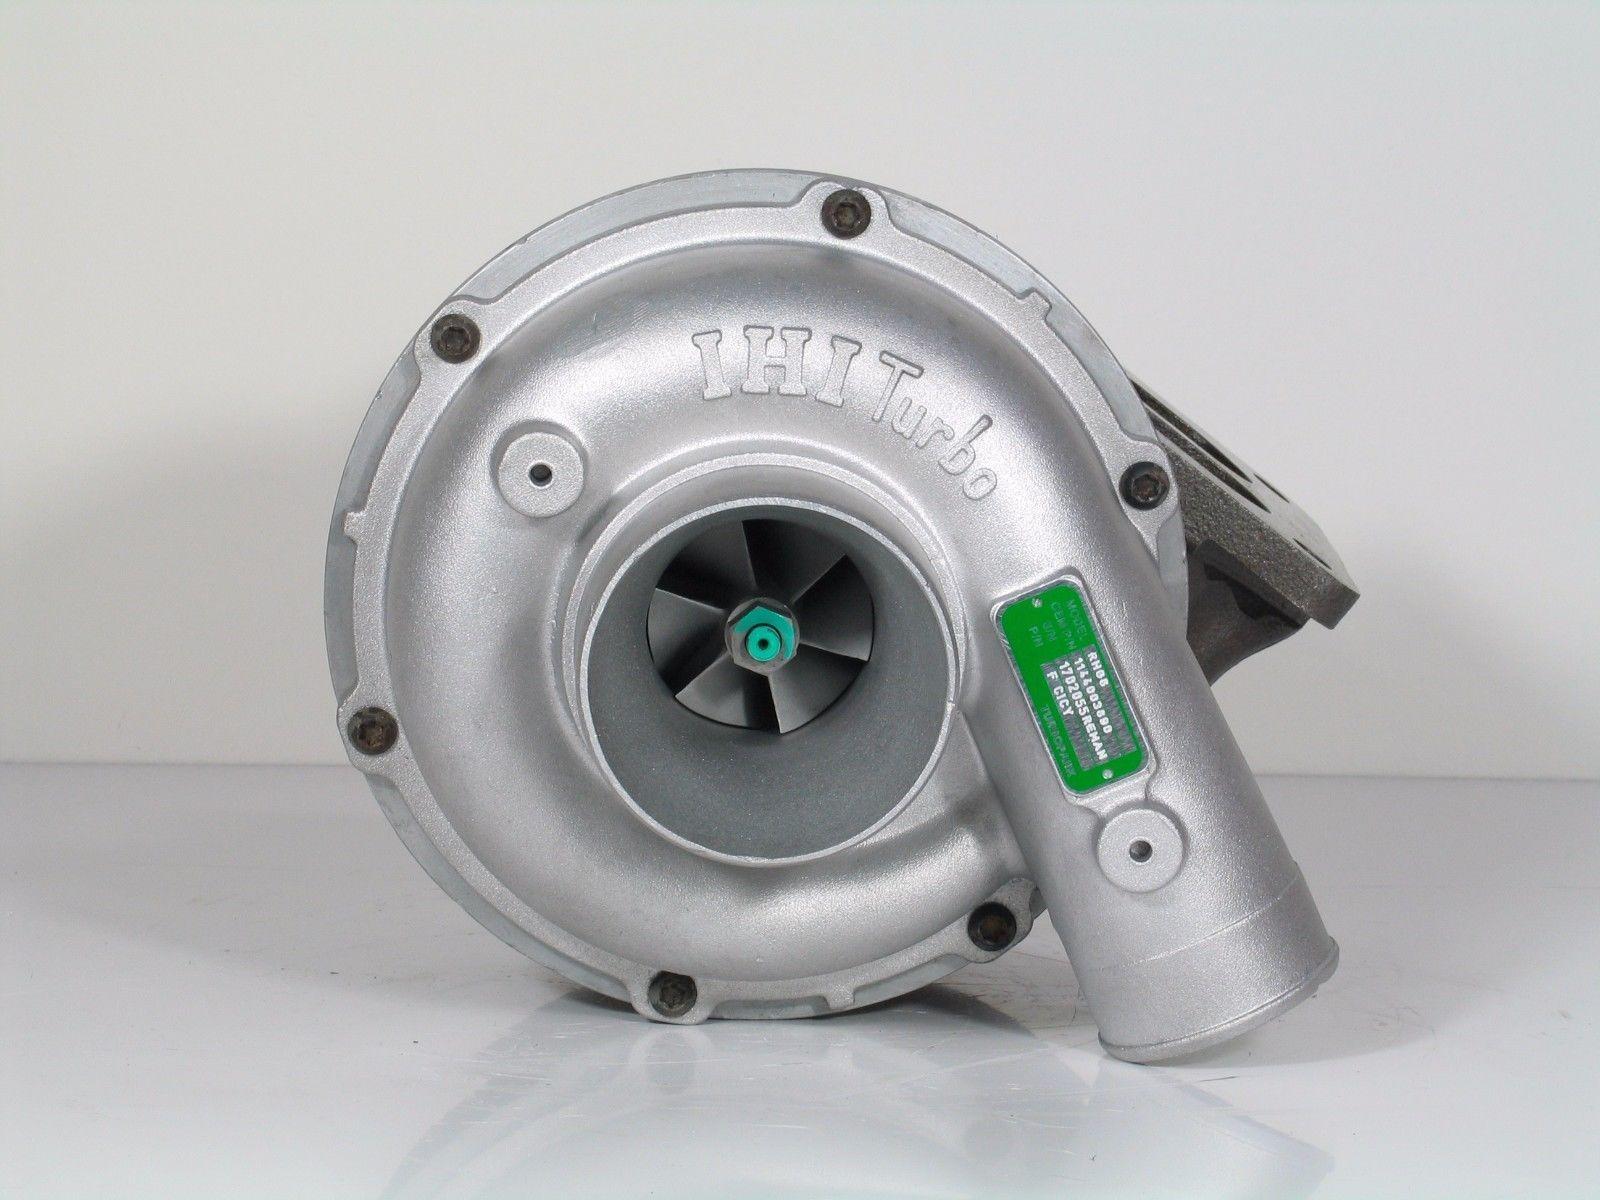 Details about RHG6 Turbocharger Isuzu Sumitomo Hitachi Earth